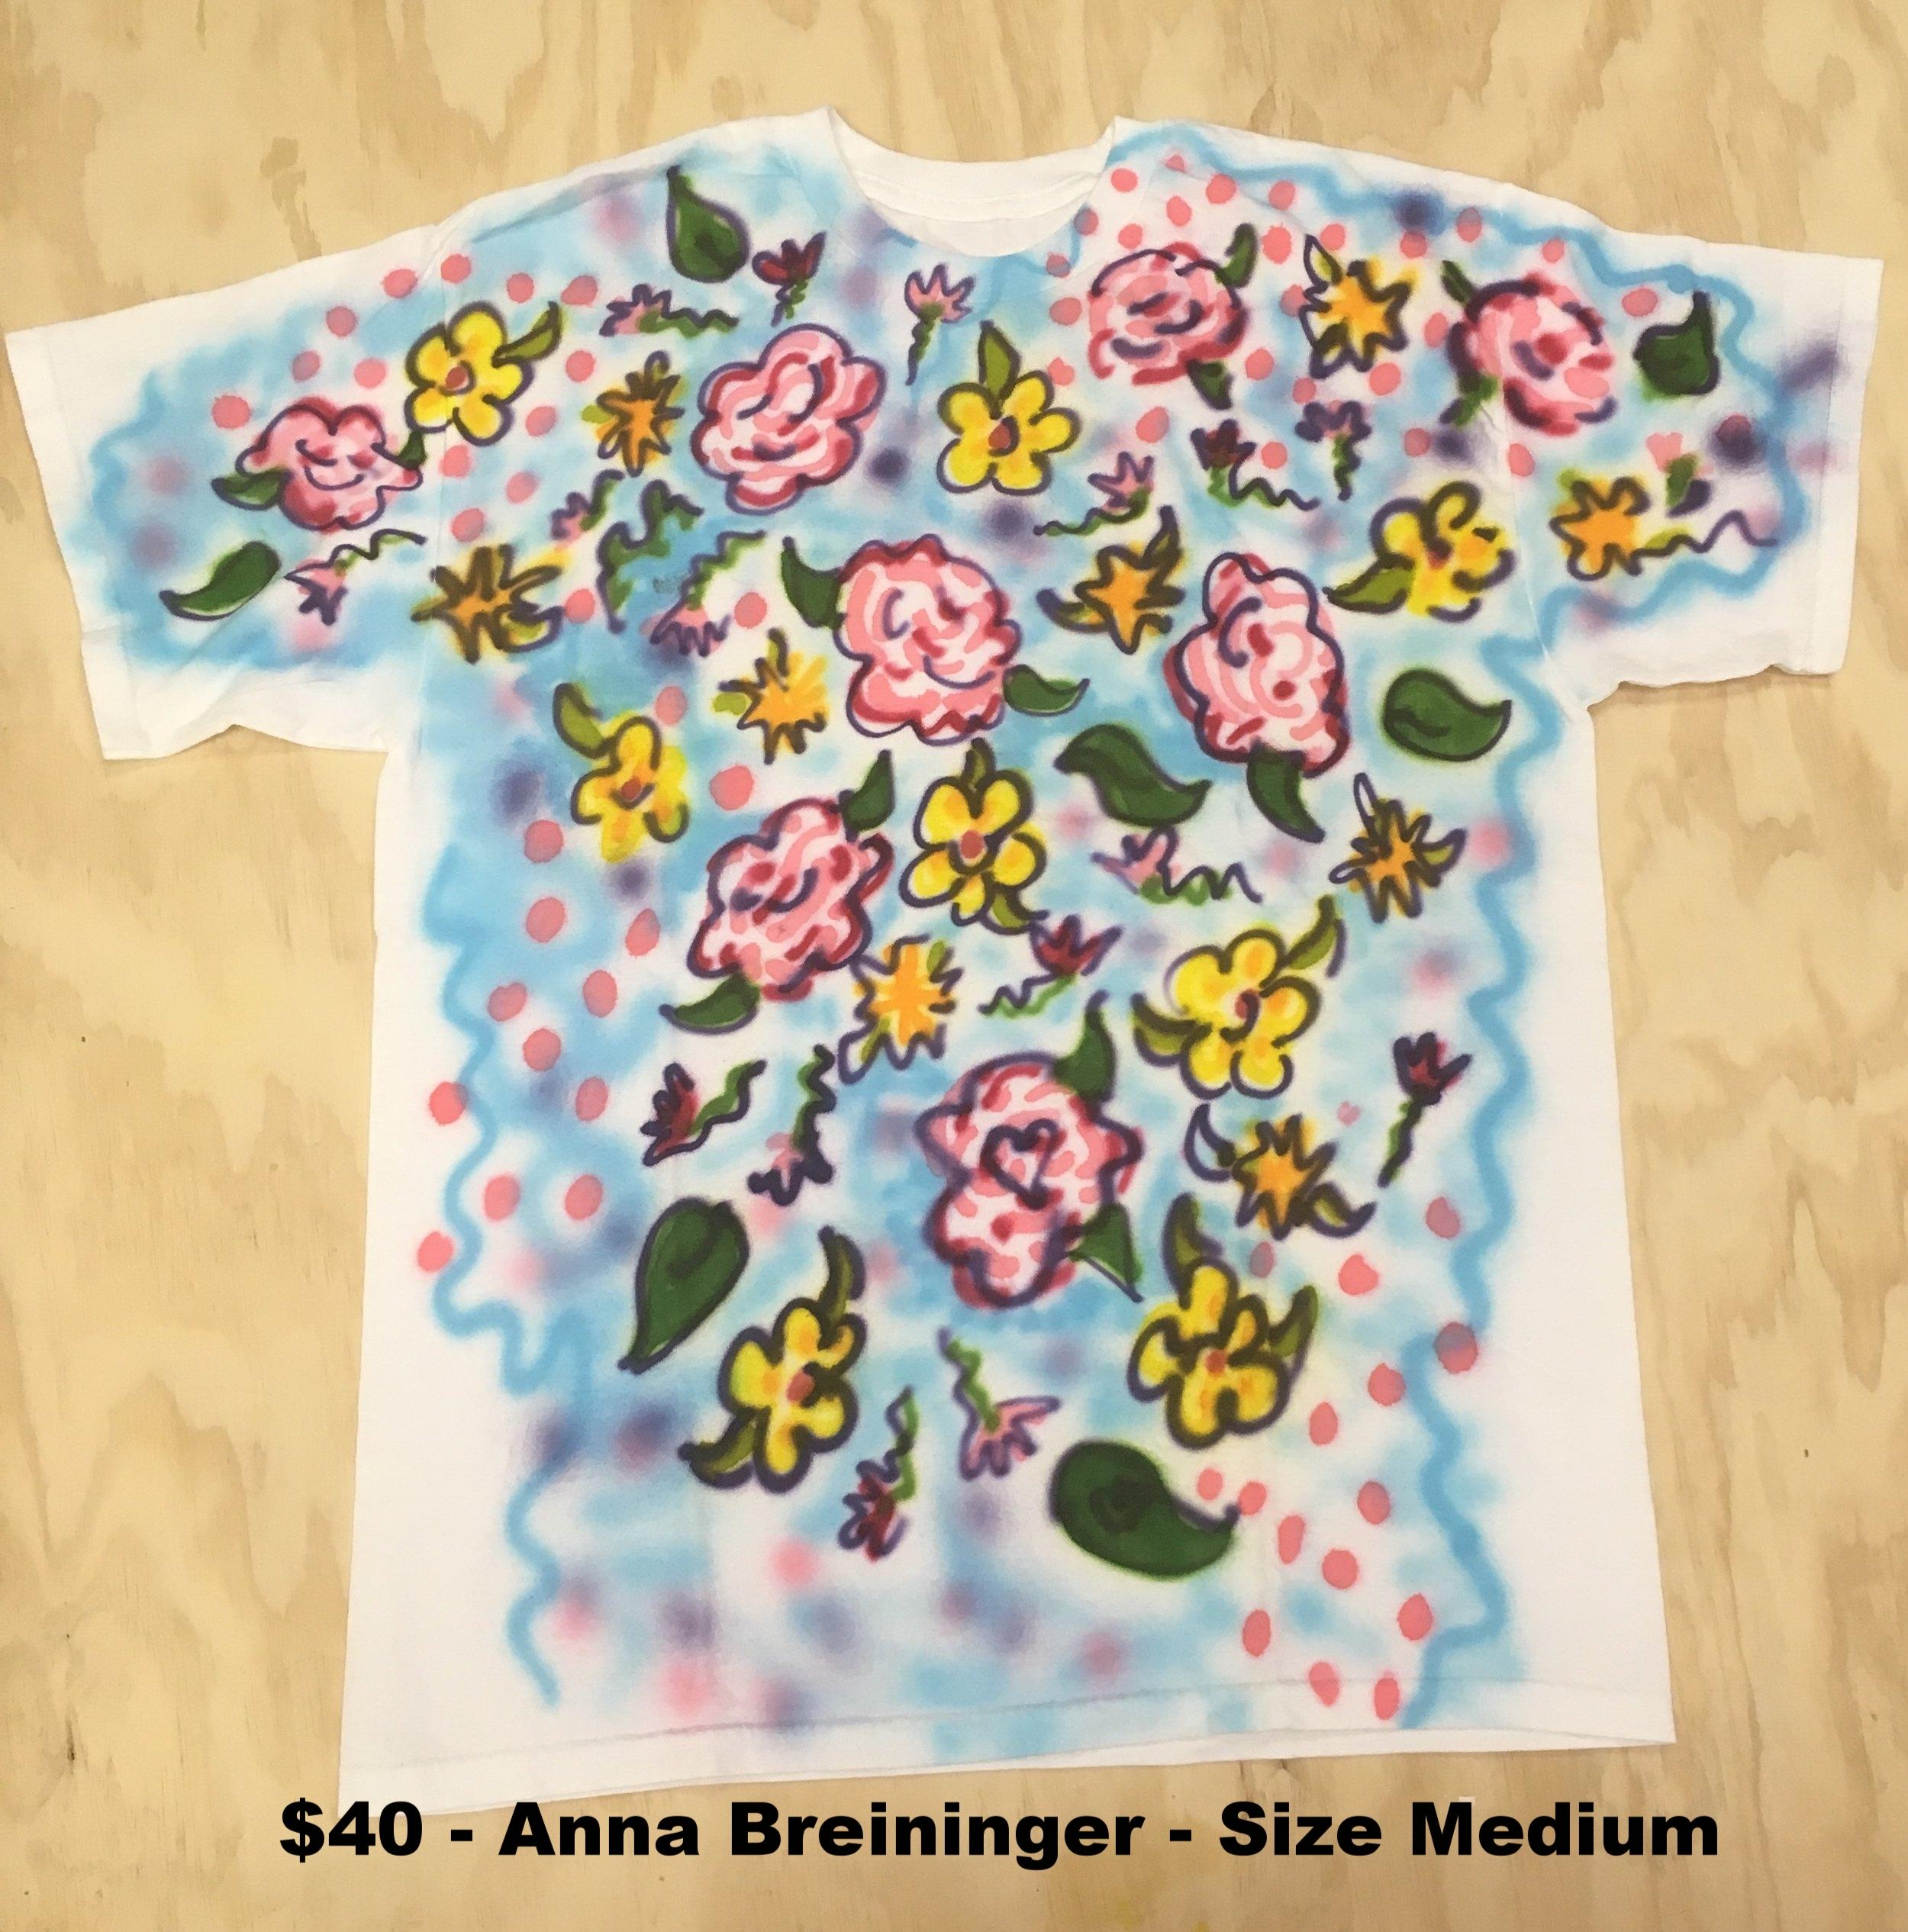 $40 - Anna Breininger - Size Medium